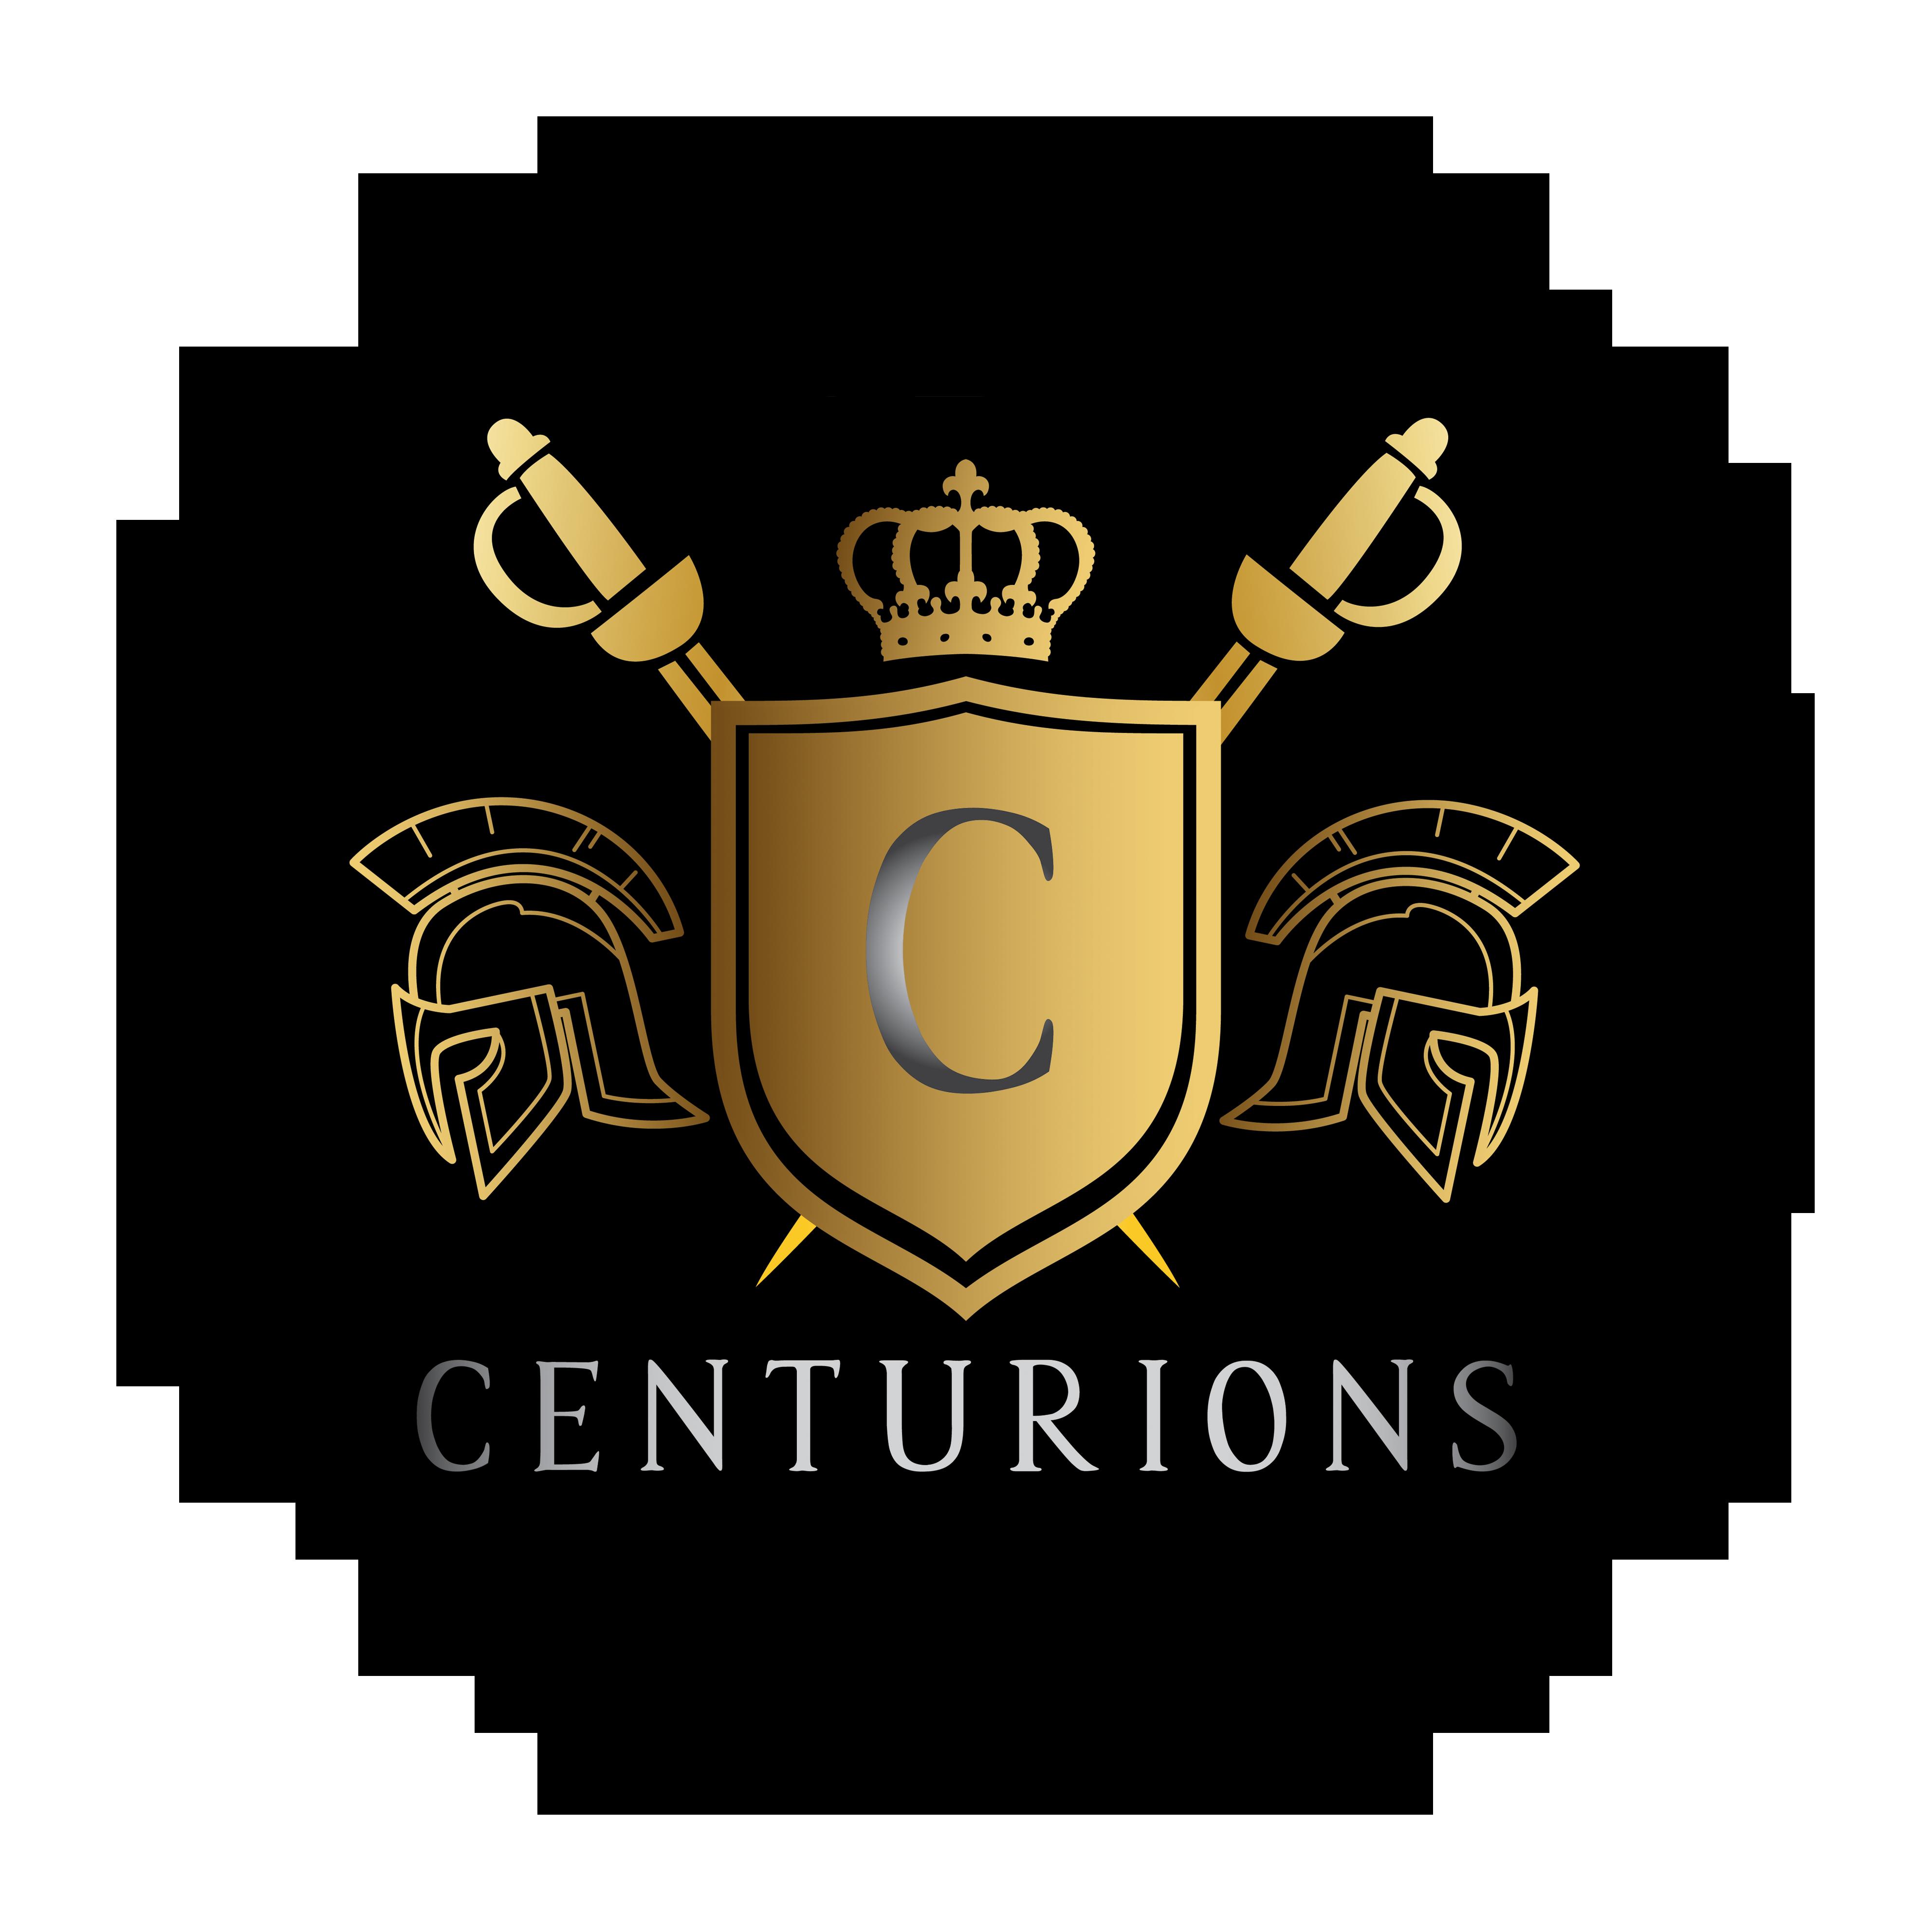 centurions-logo1.png